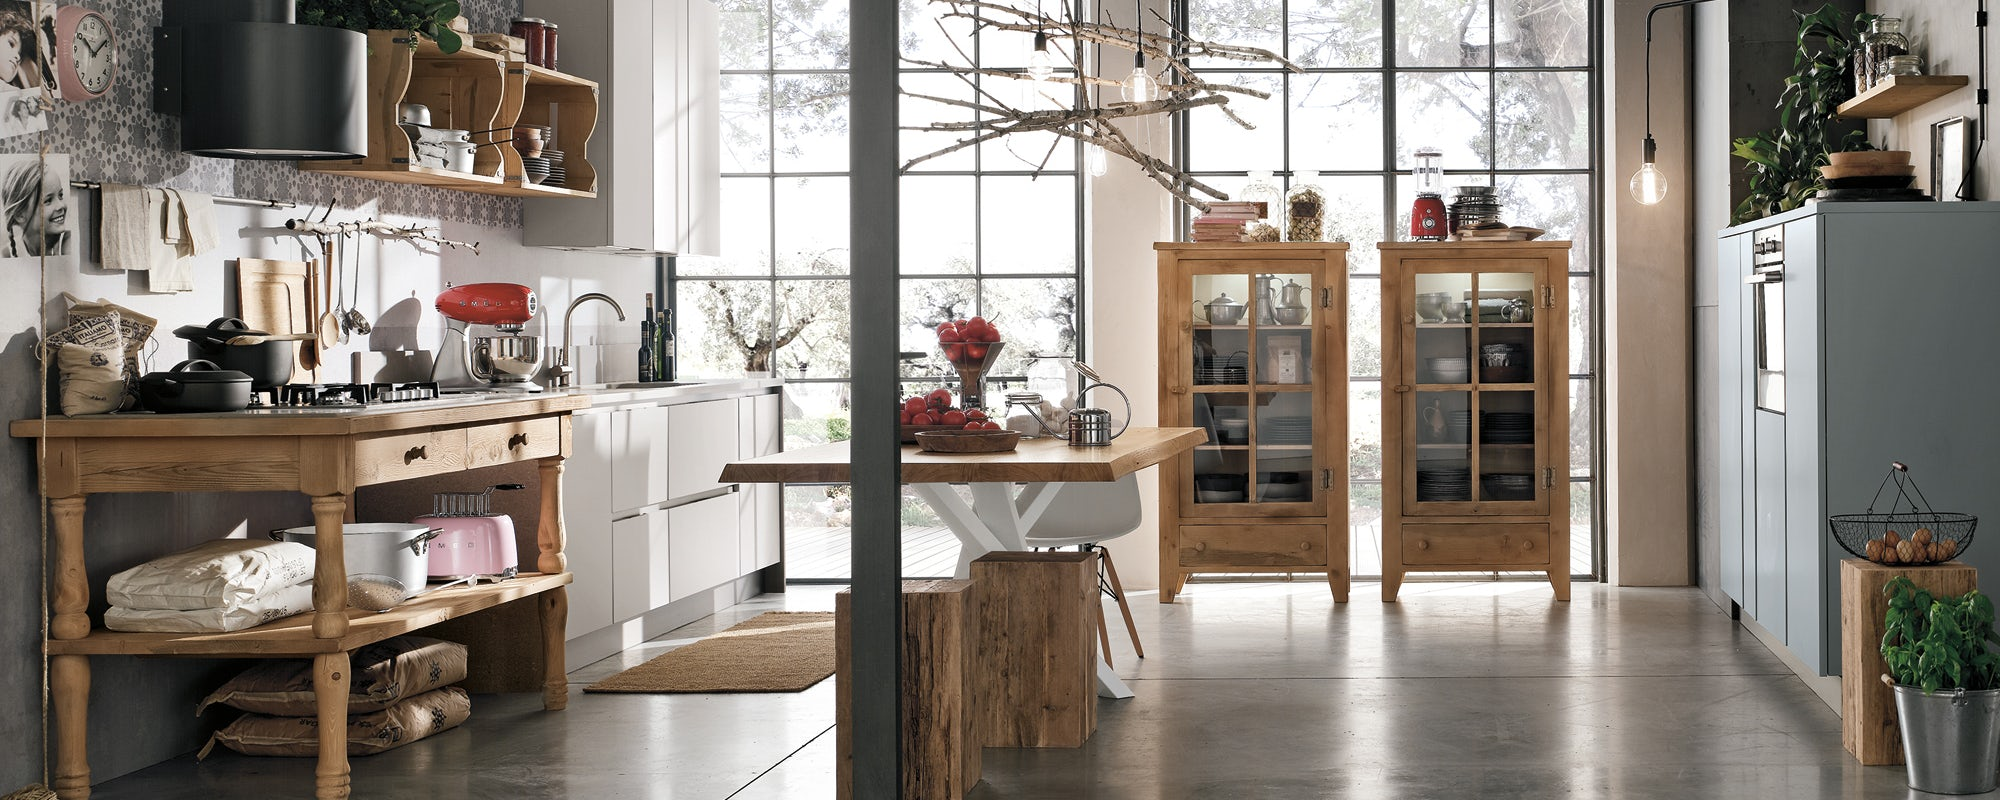 cucine componibili lissone monza   Habitat Casa